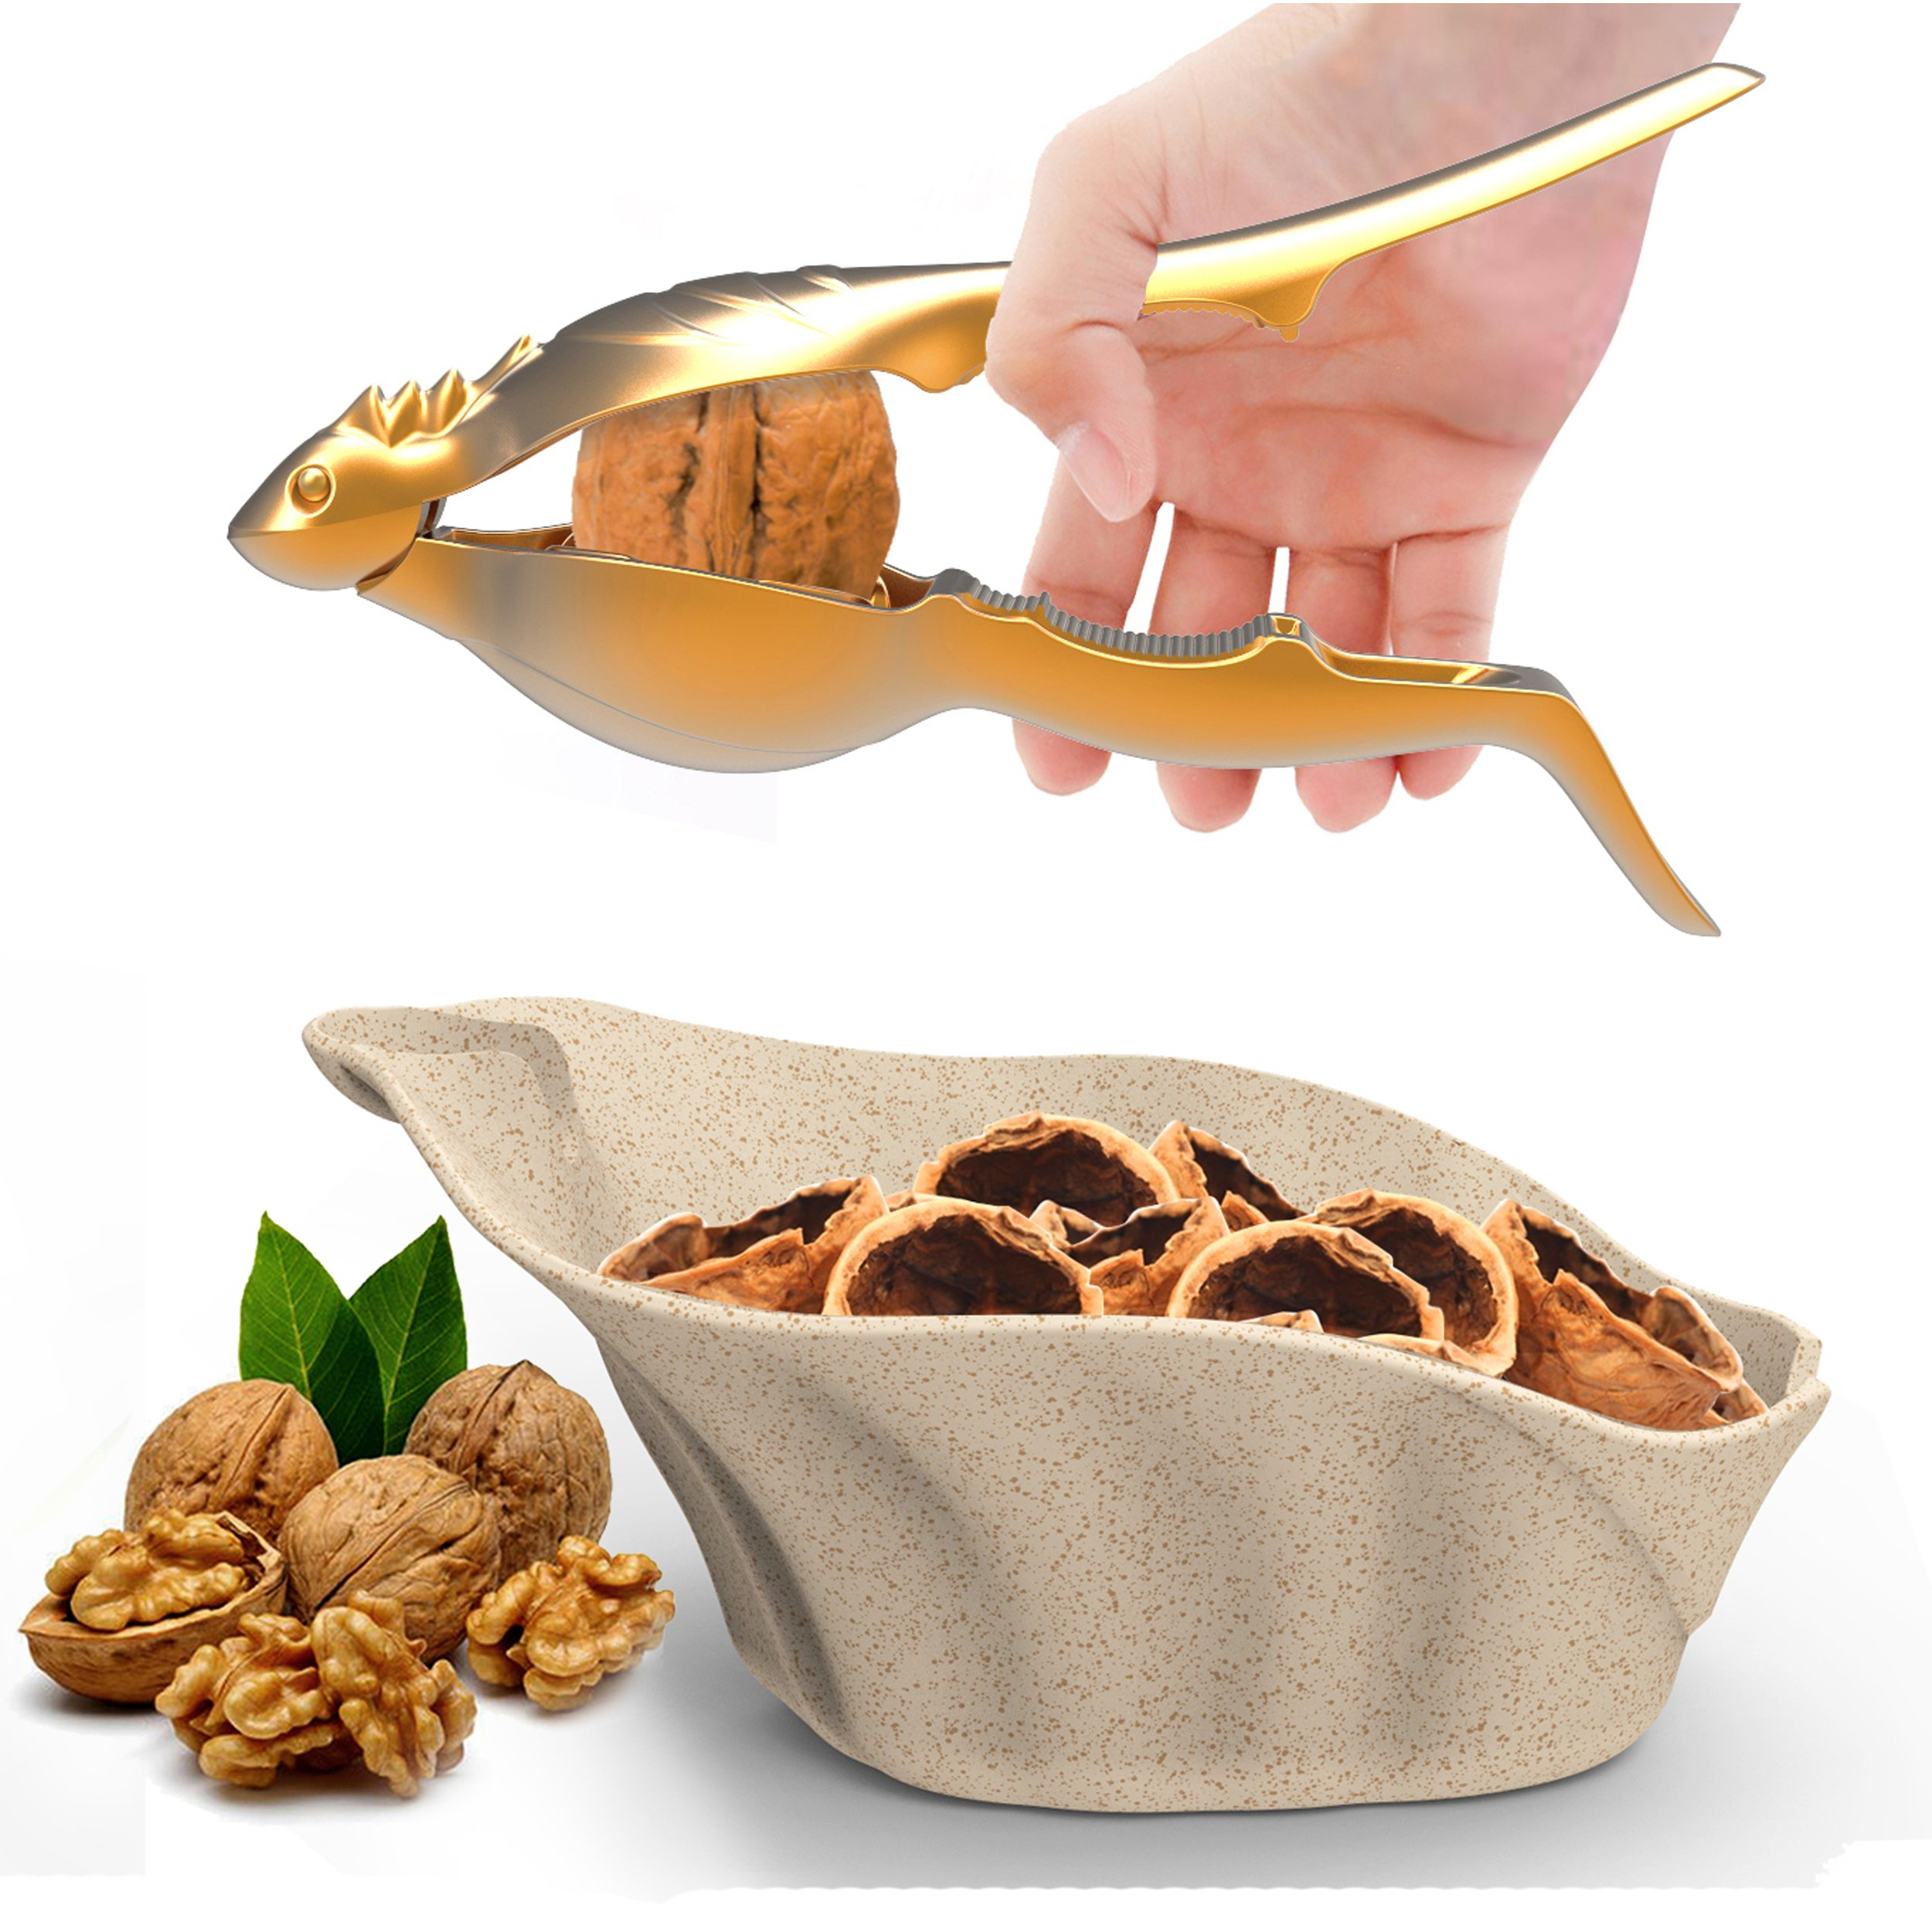 SELEWARE Innovative Universal Heavy Duty Lizard Nut Cracker Container Set, Pecan Walnut Plier Opener Tool with Non-slip Handle, Golden